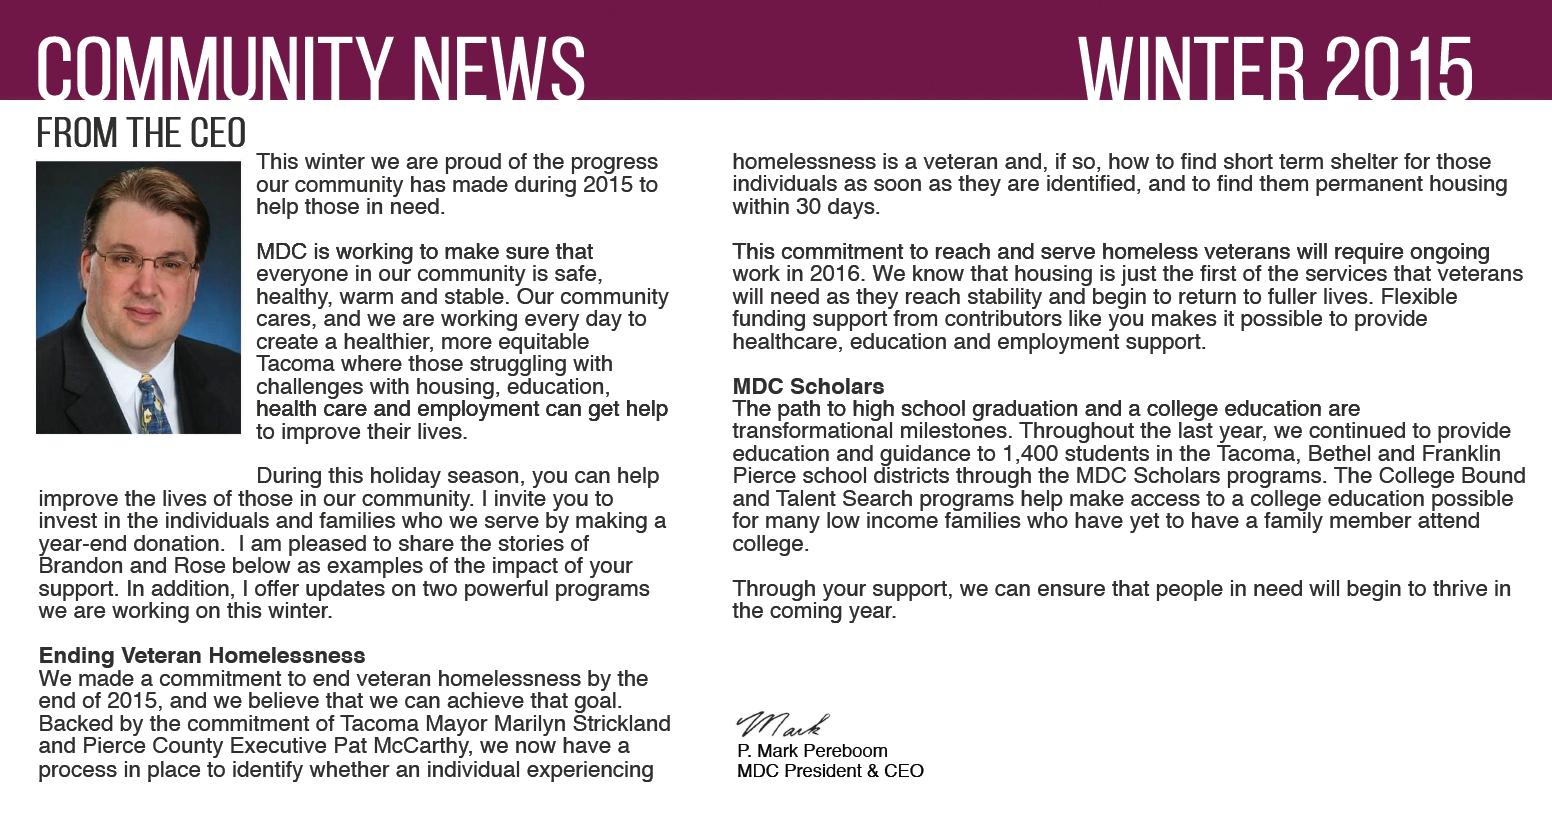 MDC Community News For Winter 2015